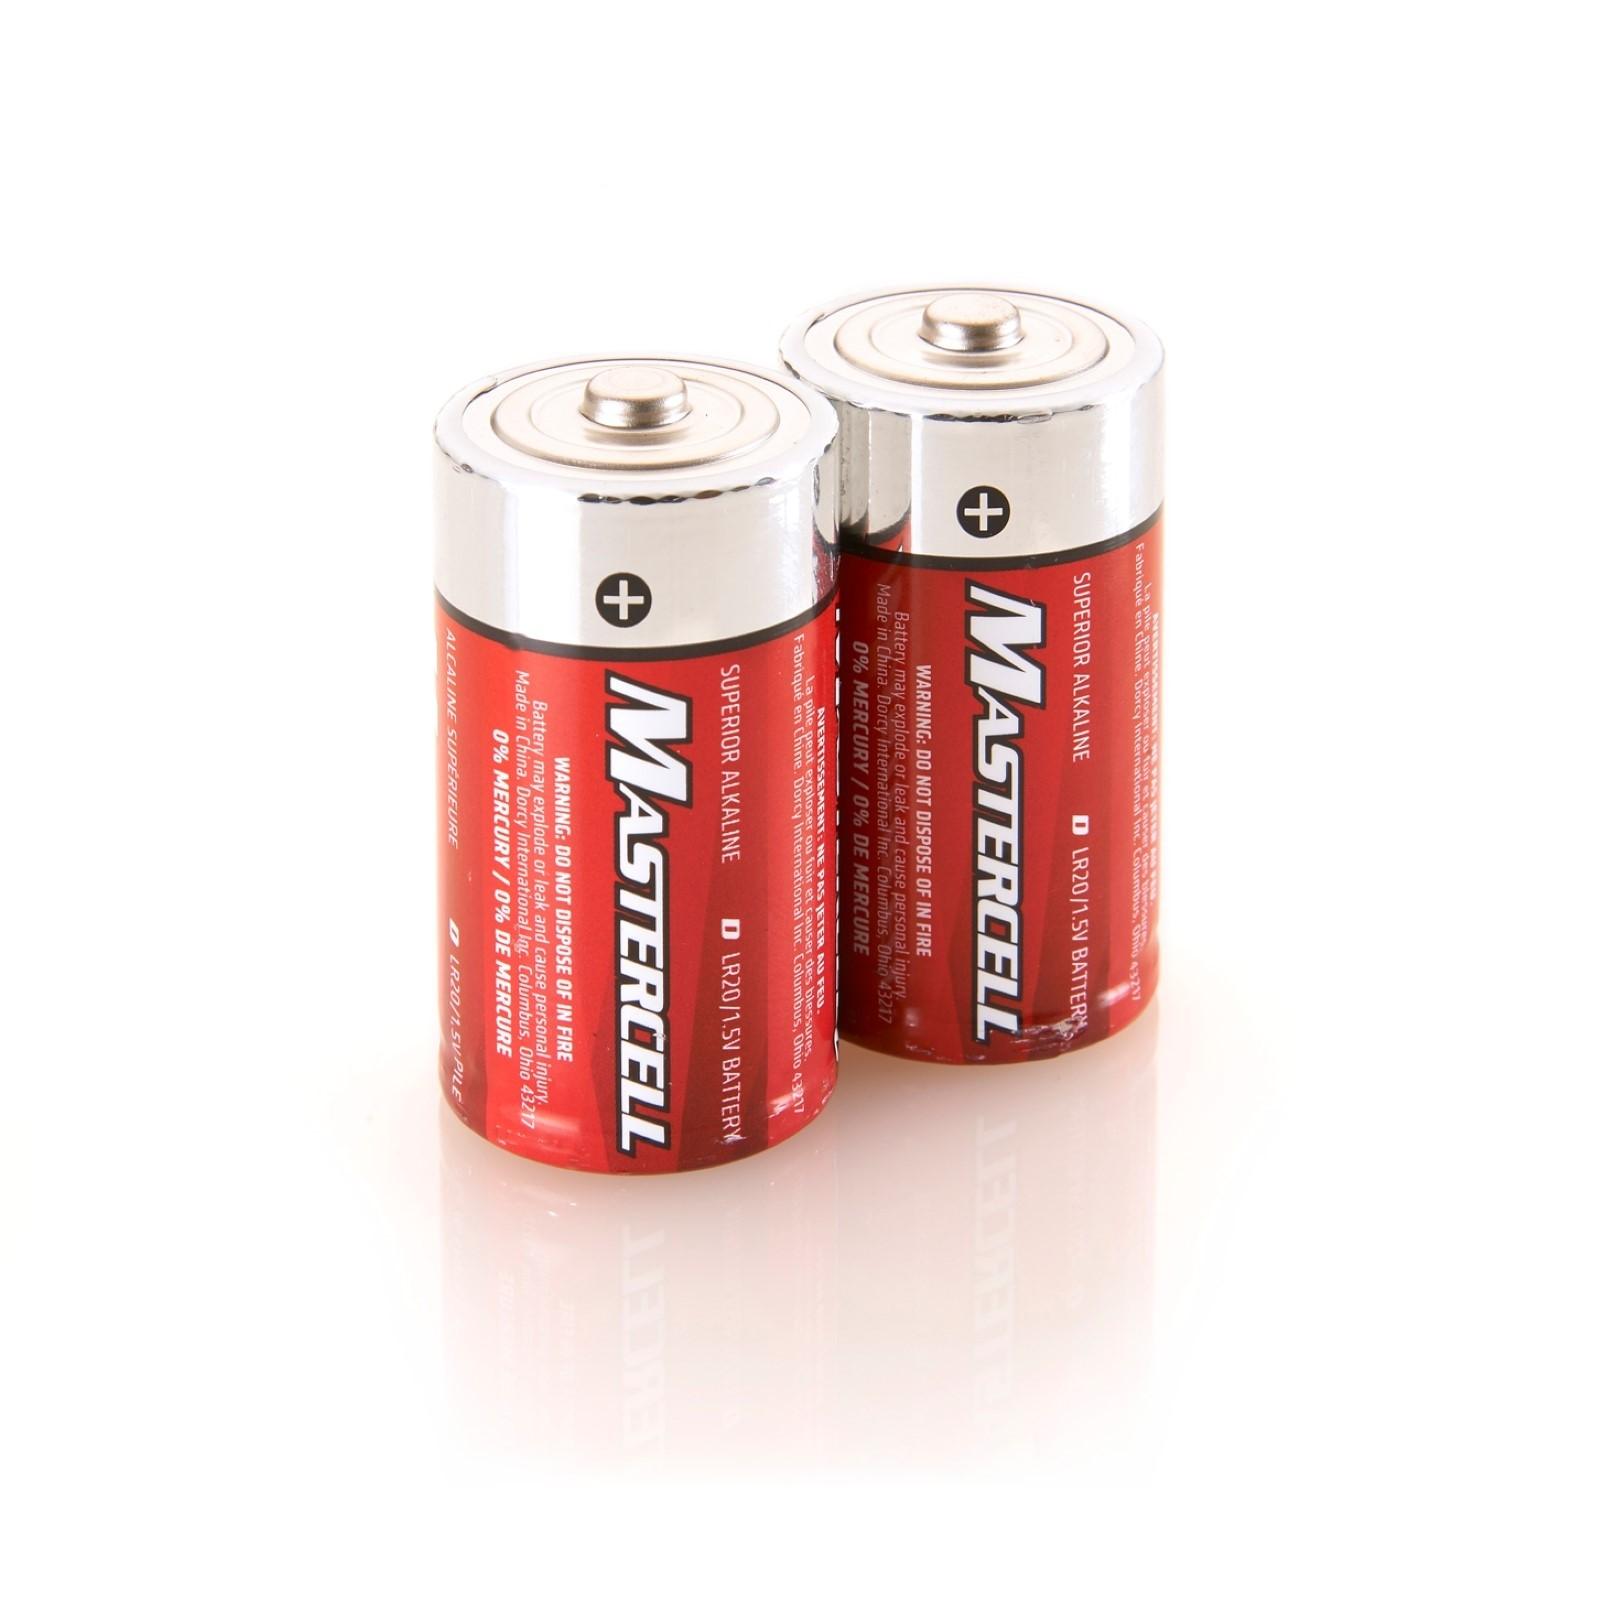 Mastercell D Alkaline (2 Pack)